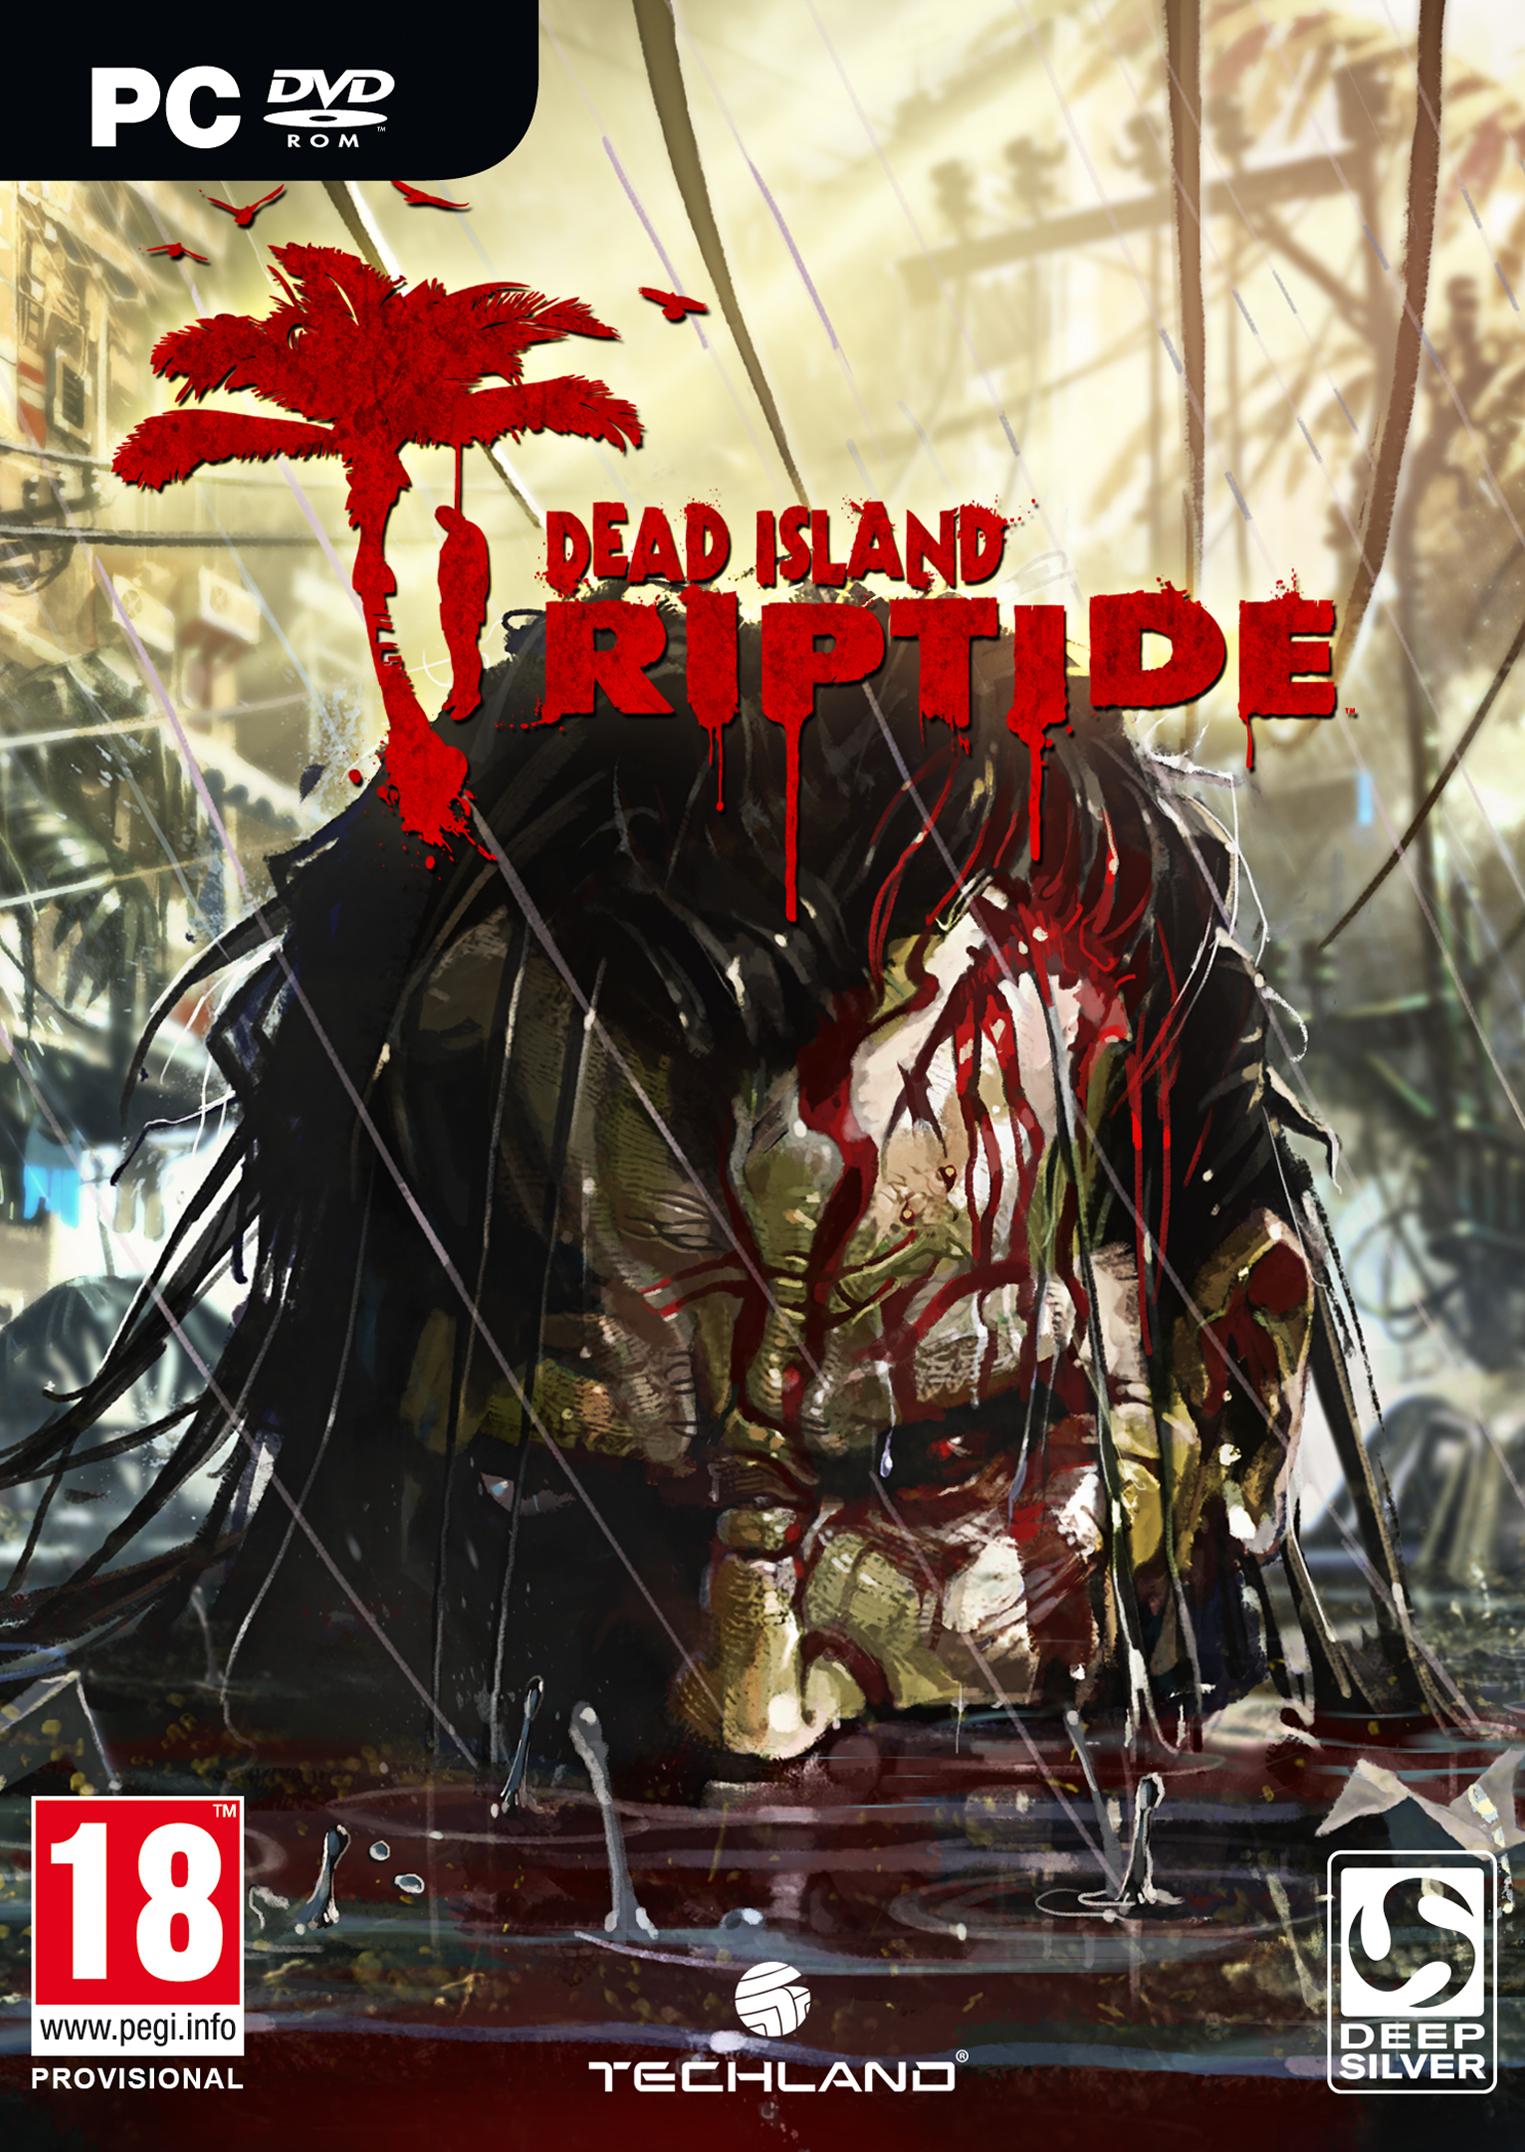 Dead Island Riptide Deutsche  Texte, Untertitel, Menüs Cover